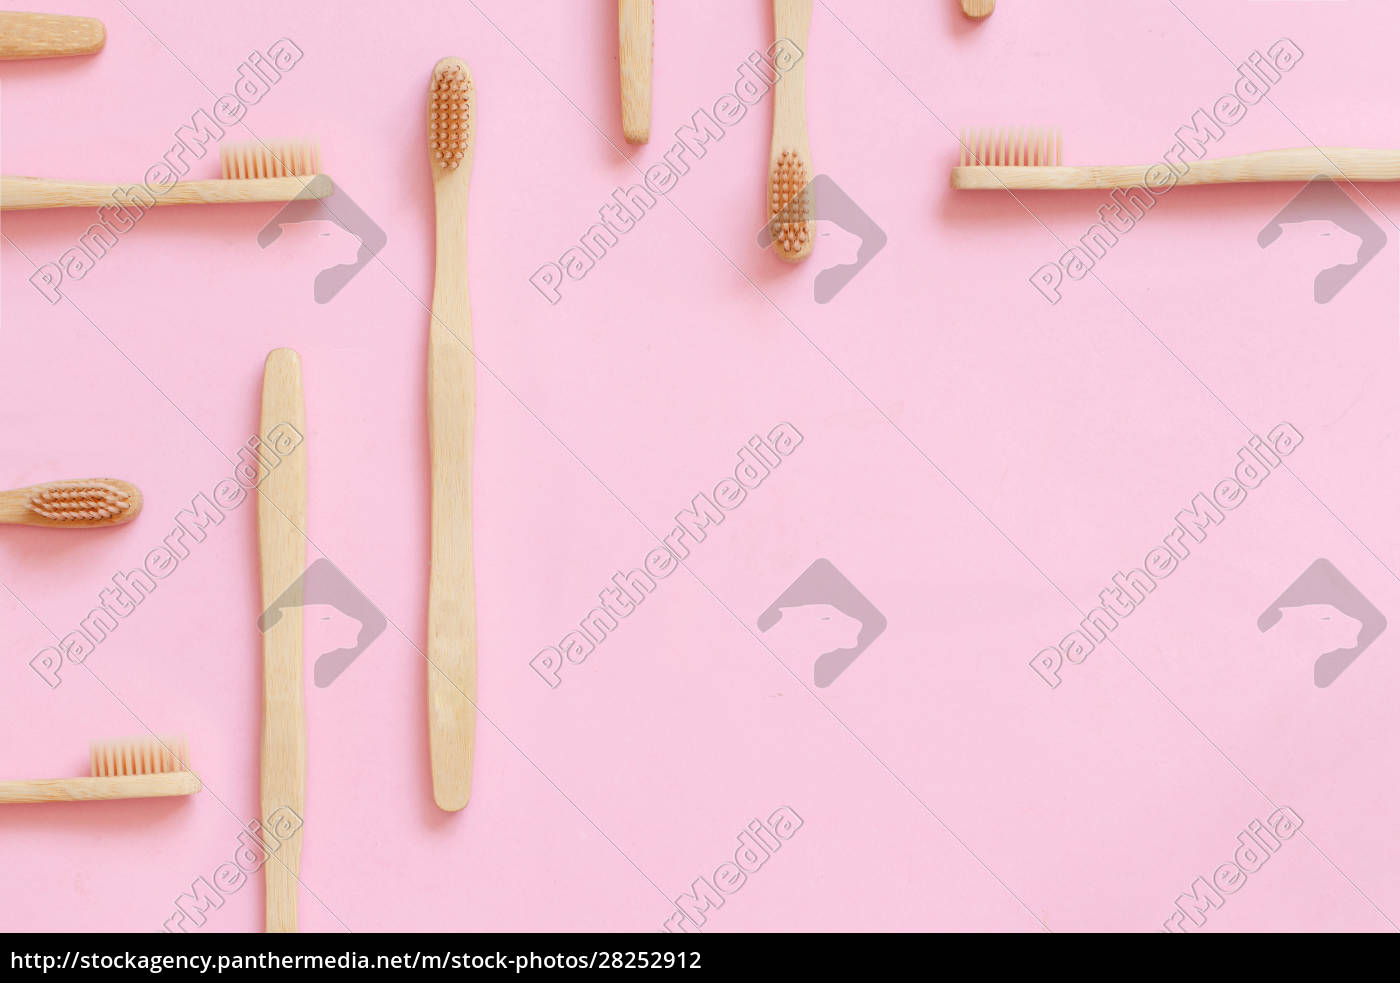 cepillos, de, dientes, de, bambú, ecológicos - 28252912